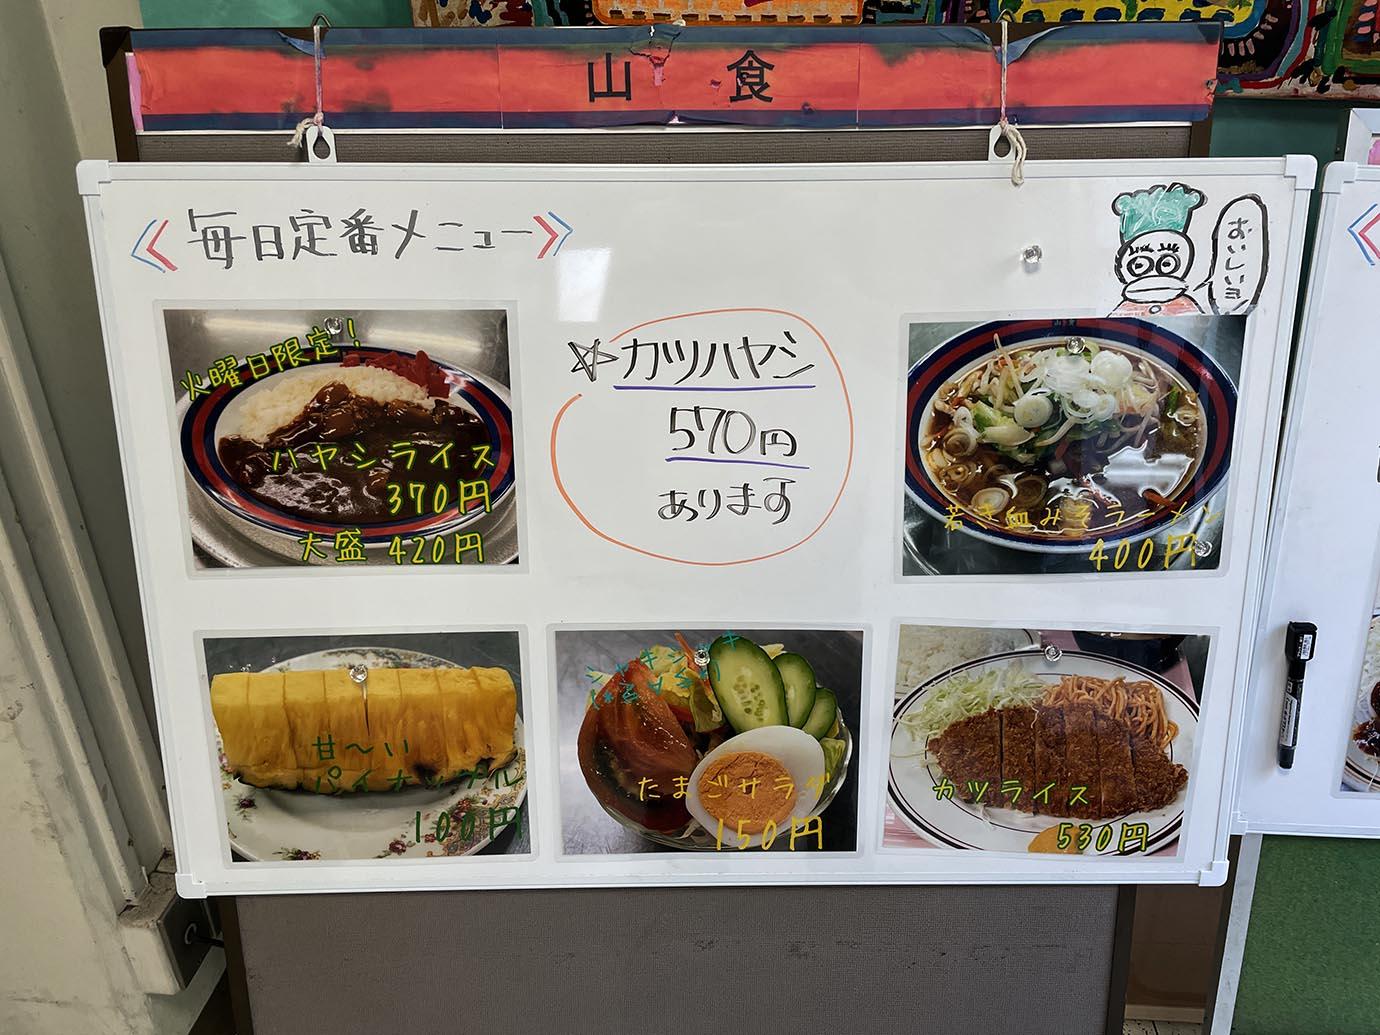 keio-university-cafeteria-pork-cutlet12